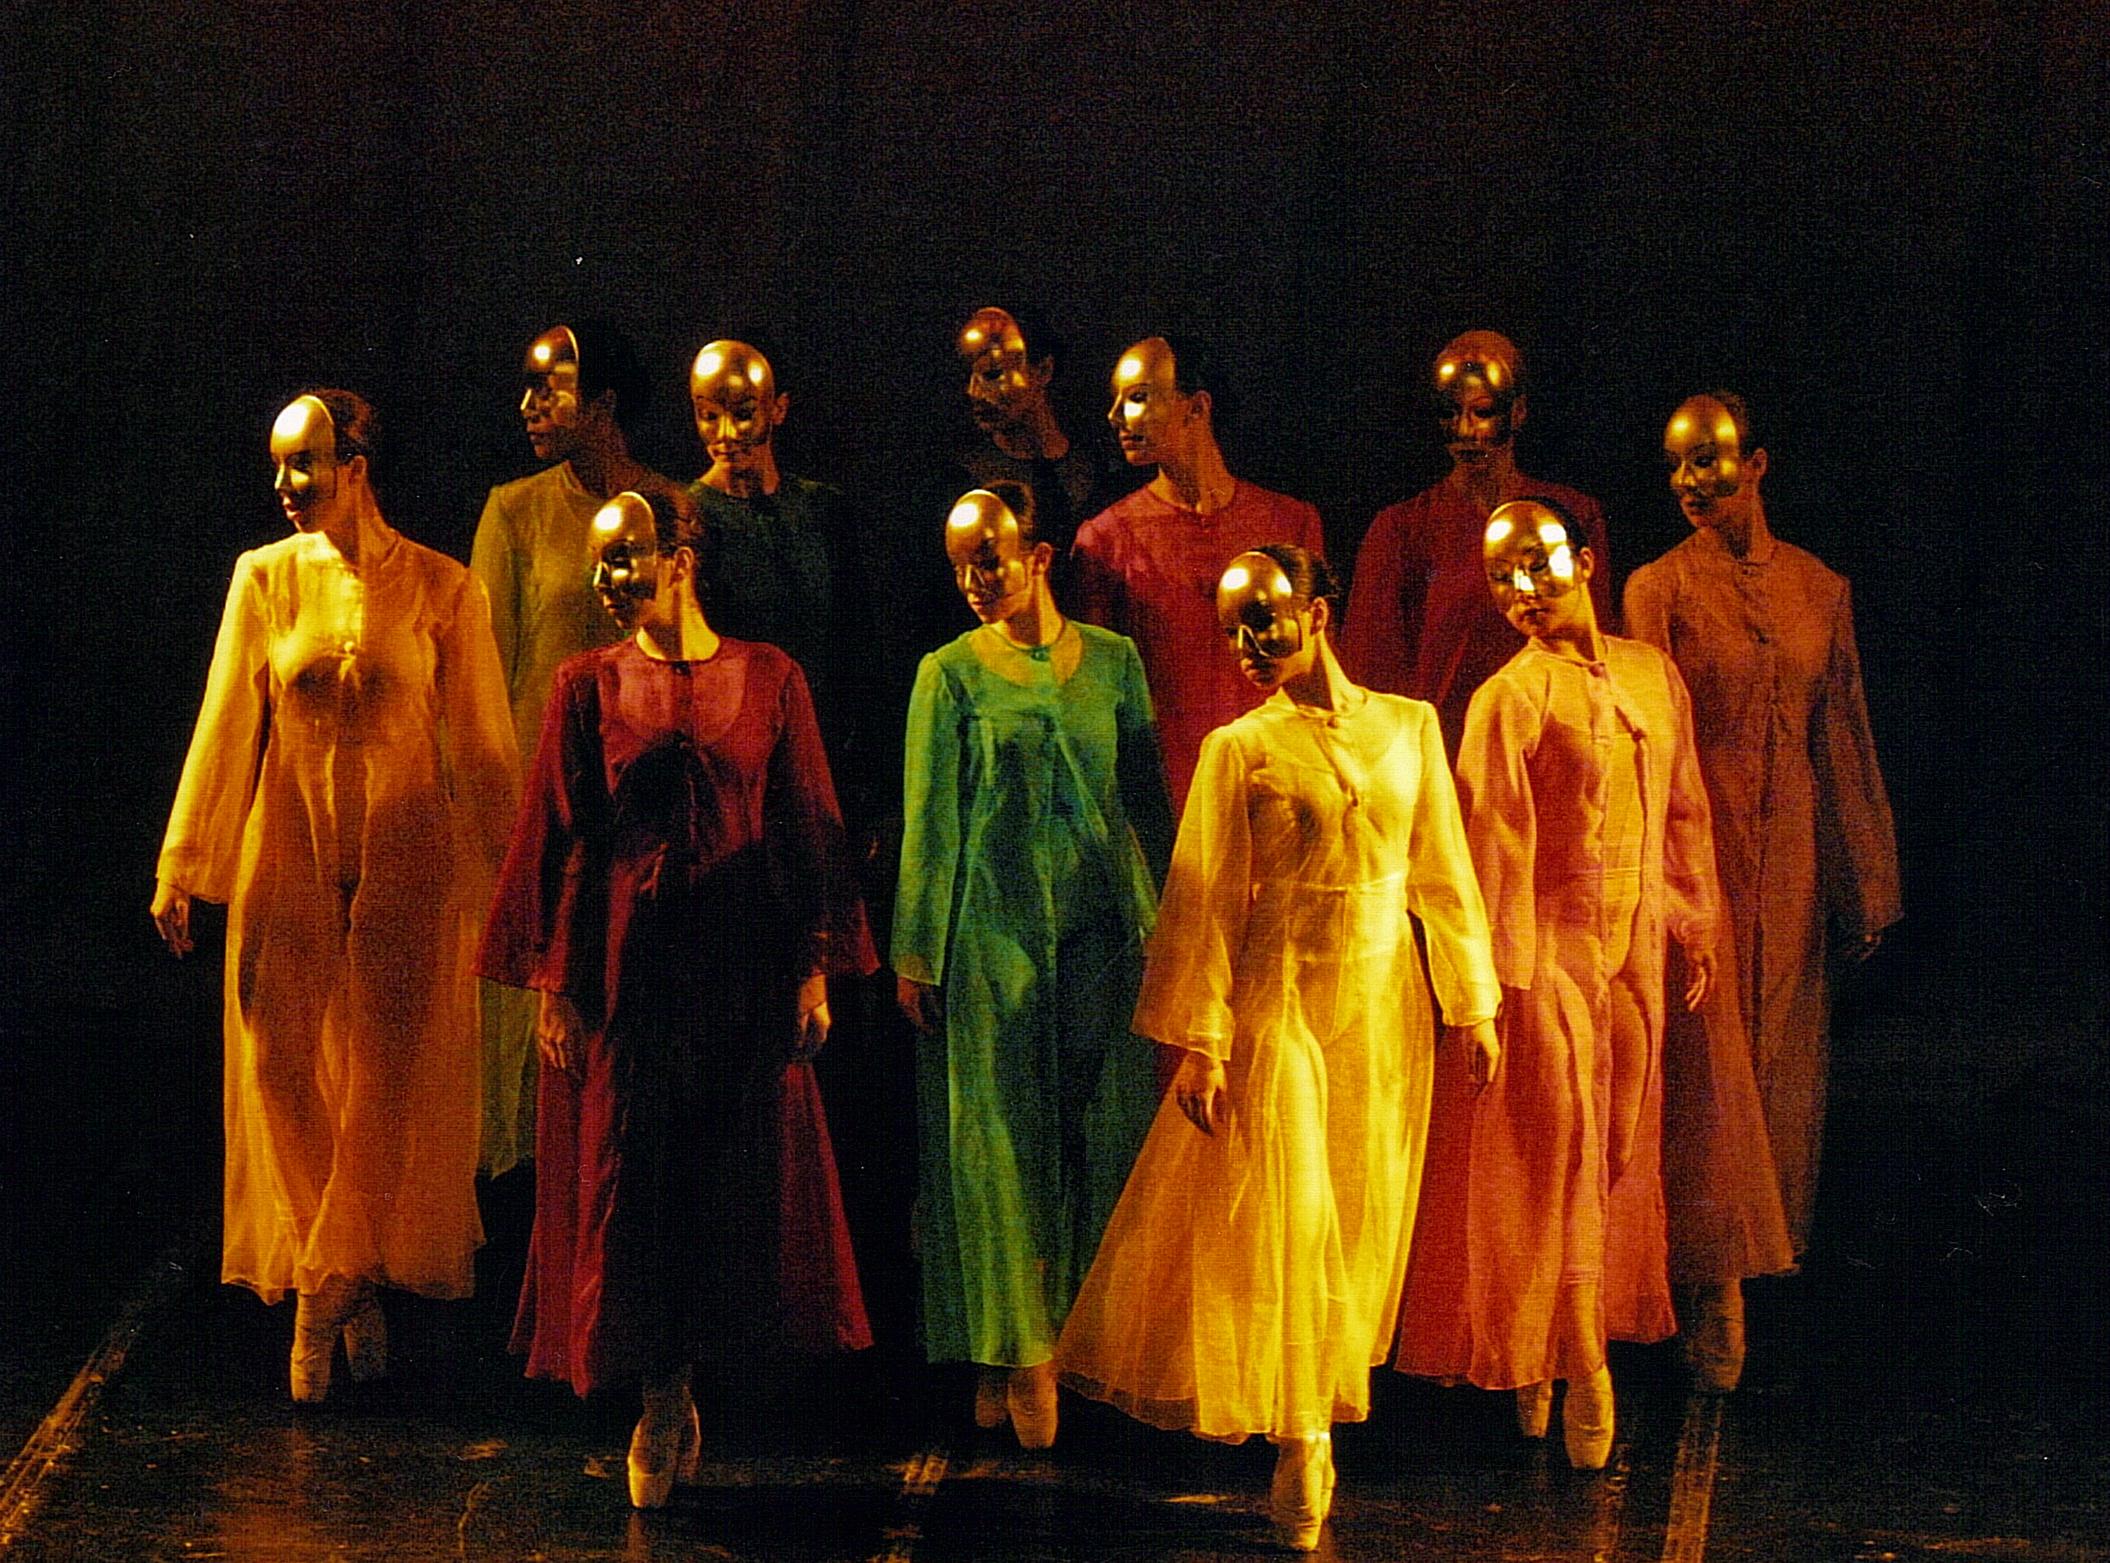 Avangardee - 2001